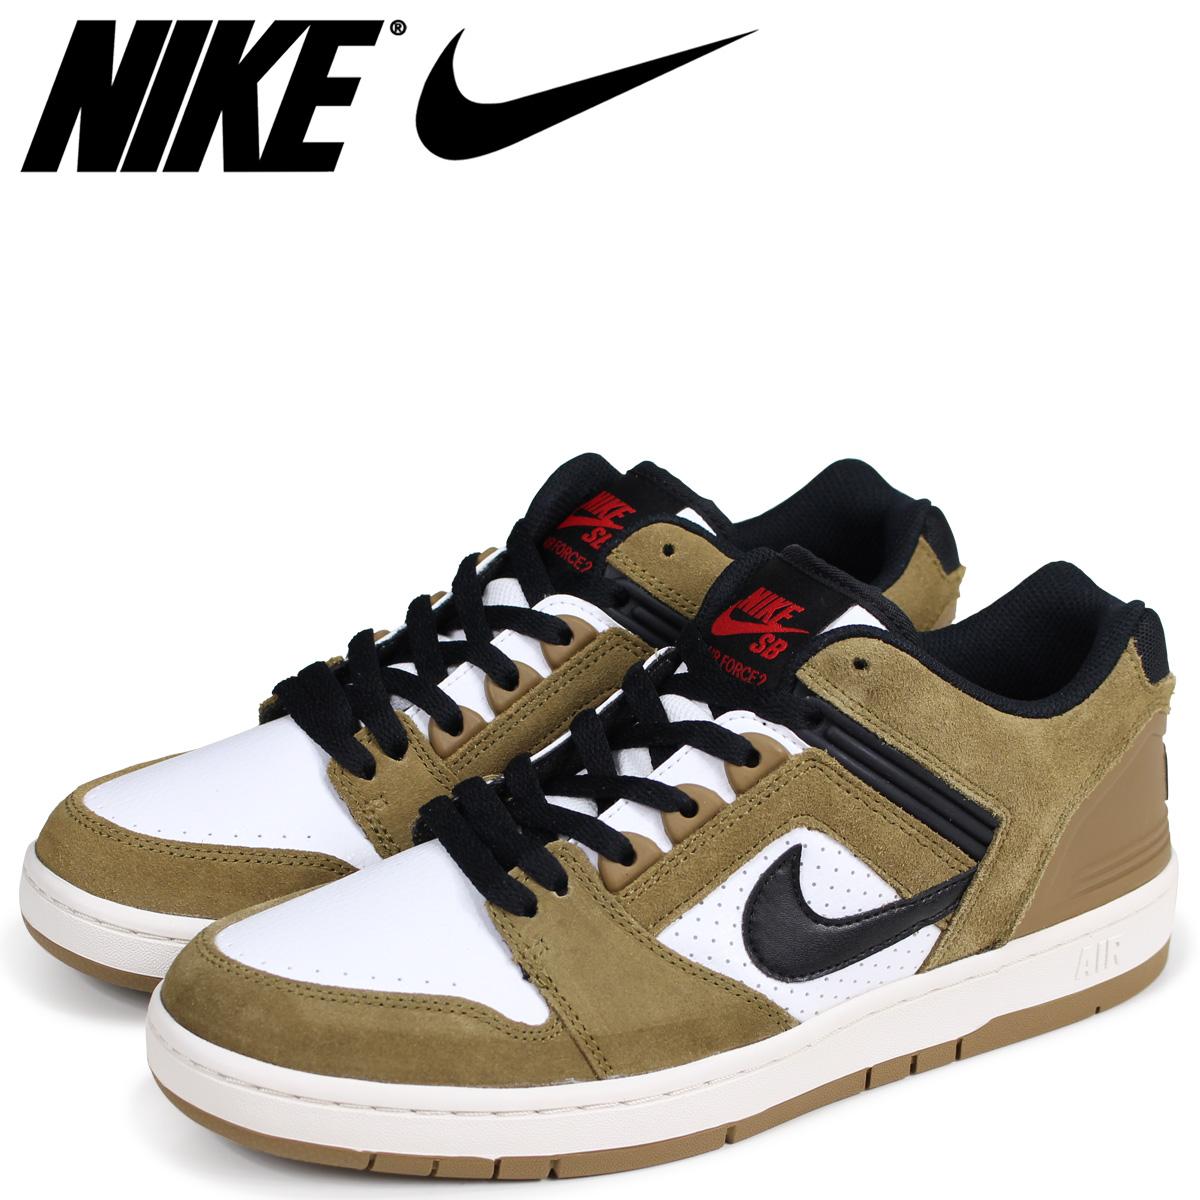 NIKE Nike SB air force 2 sneakers men AIR FORCE 2 LOW ESCAPE AO0300 300 brown